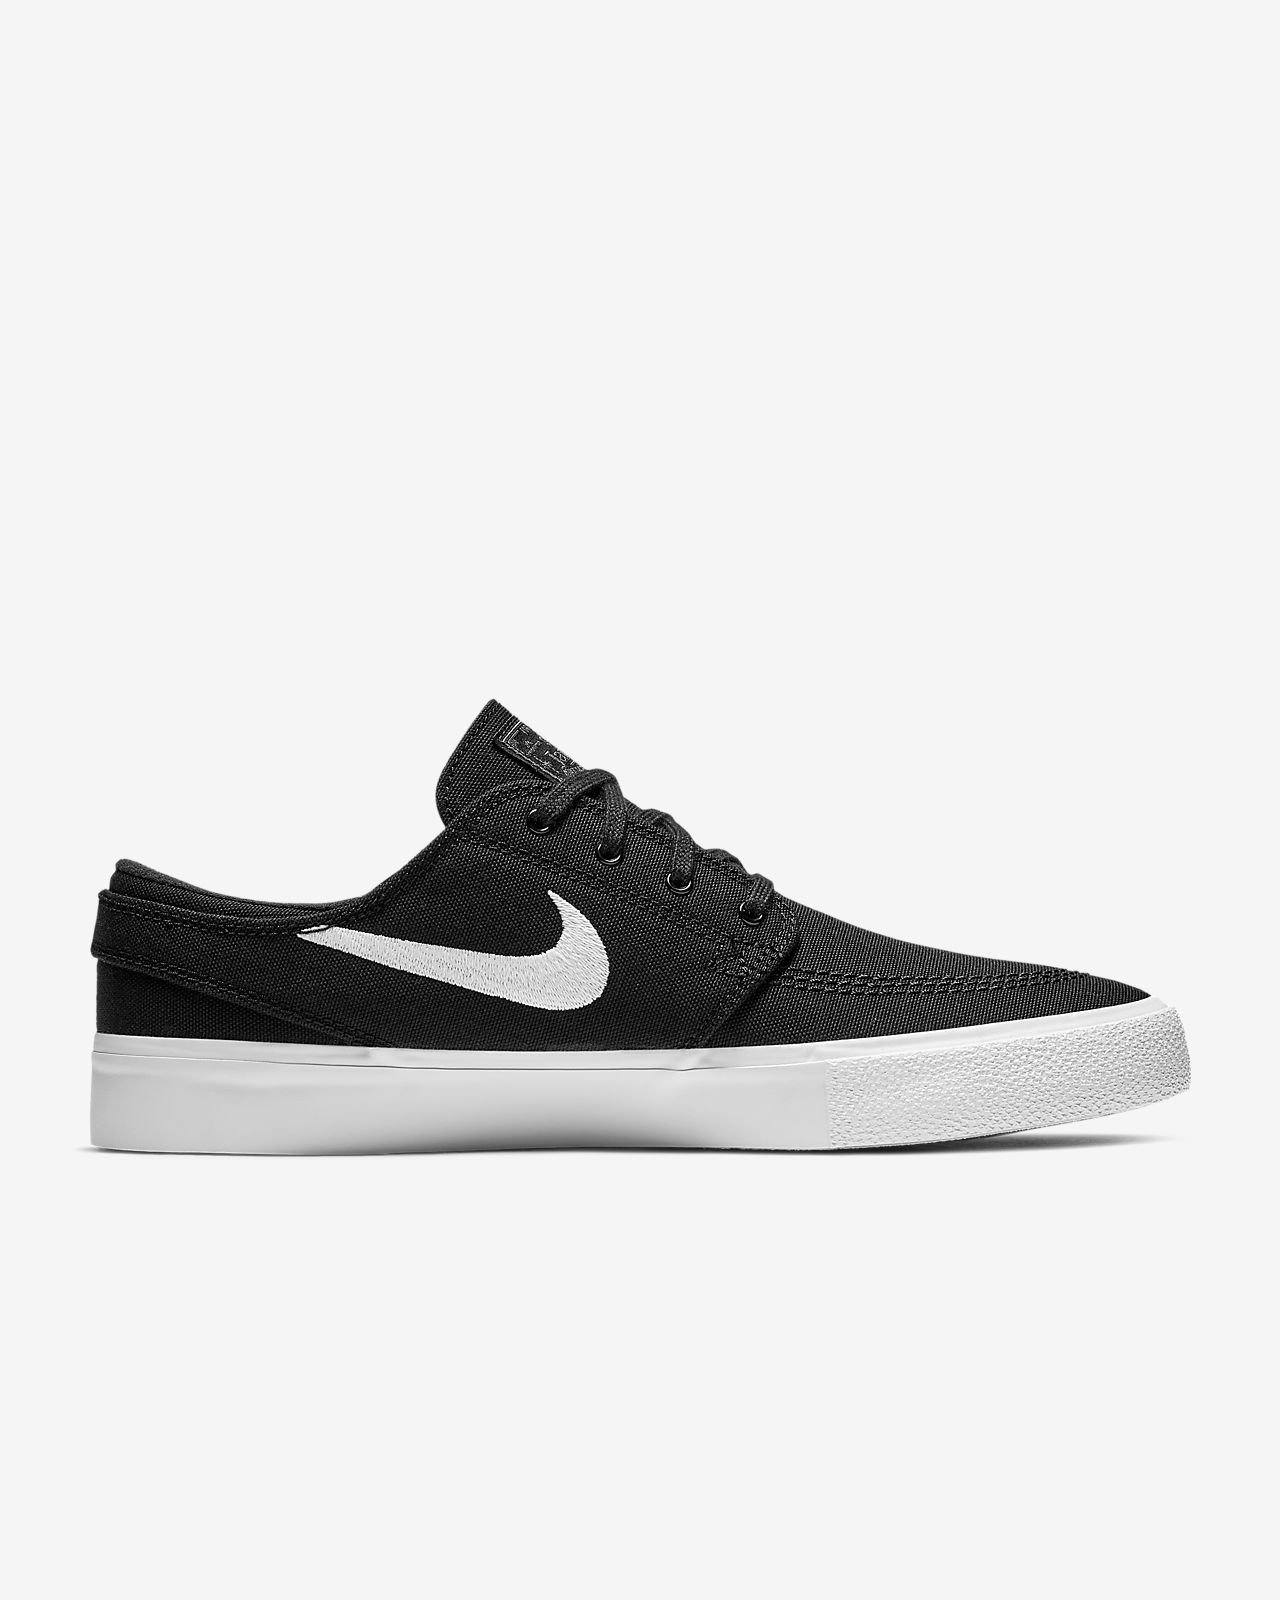 Trainers | Nike SB Mens Zoom Stefan Janoski Shoes Vast Grey black